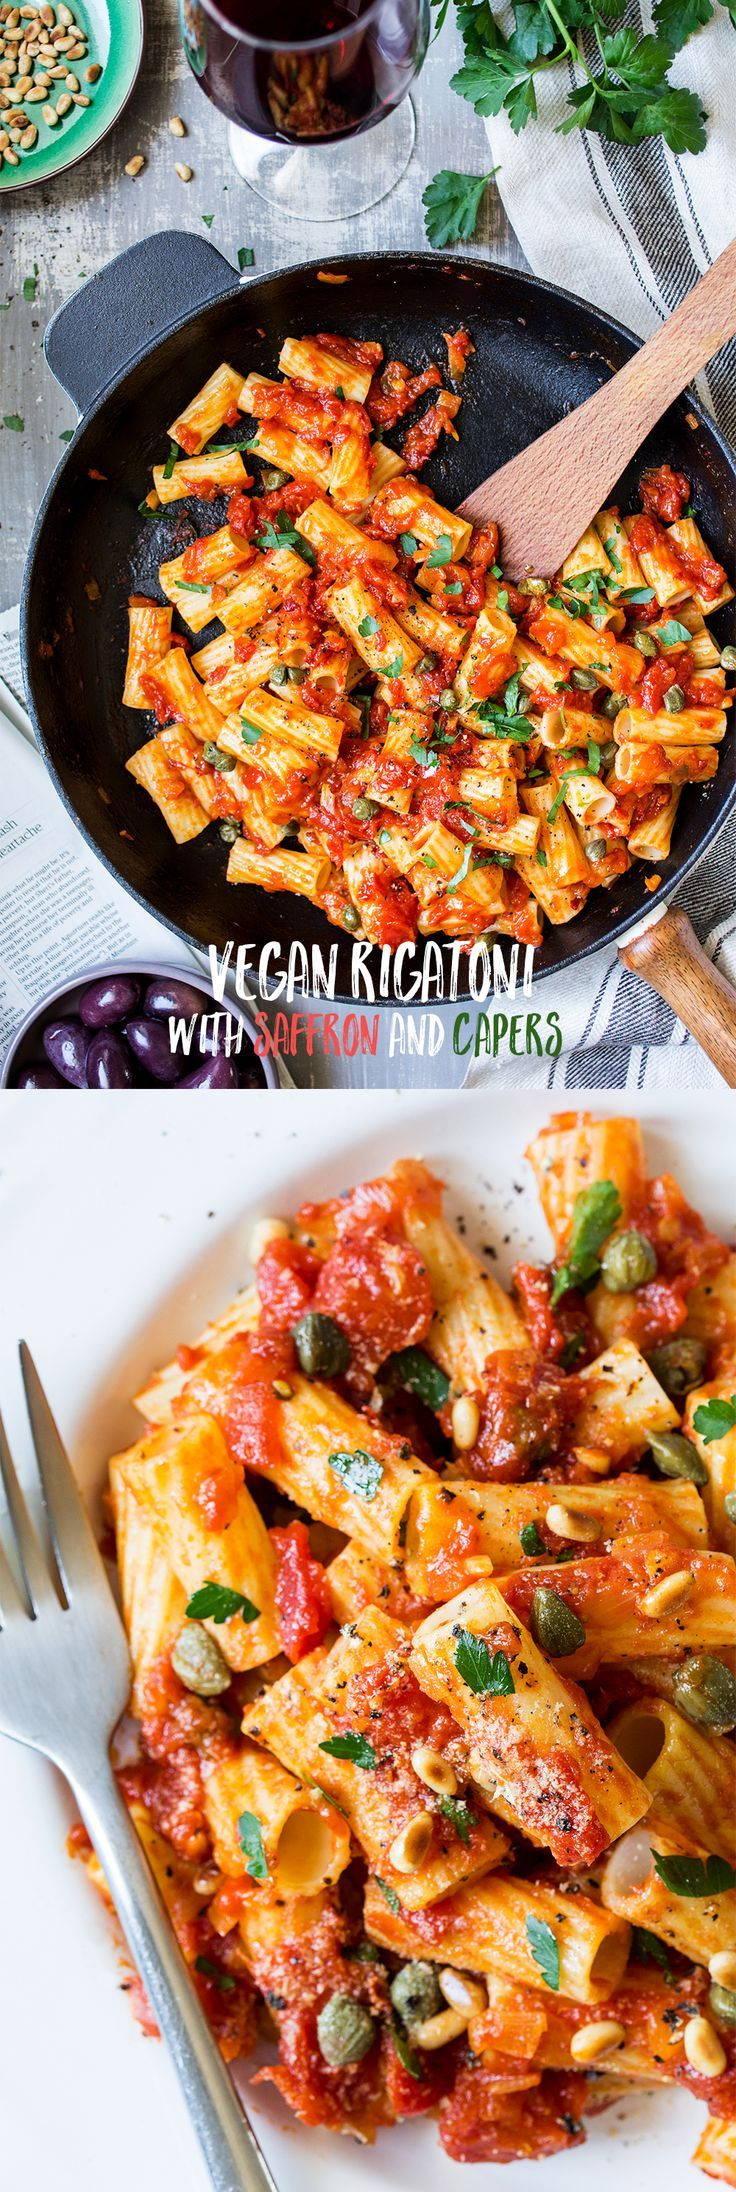 Vegan rigatoni with saffron, capers and tomatoes